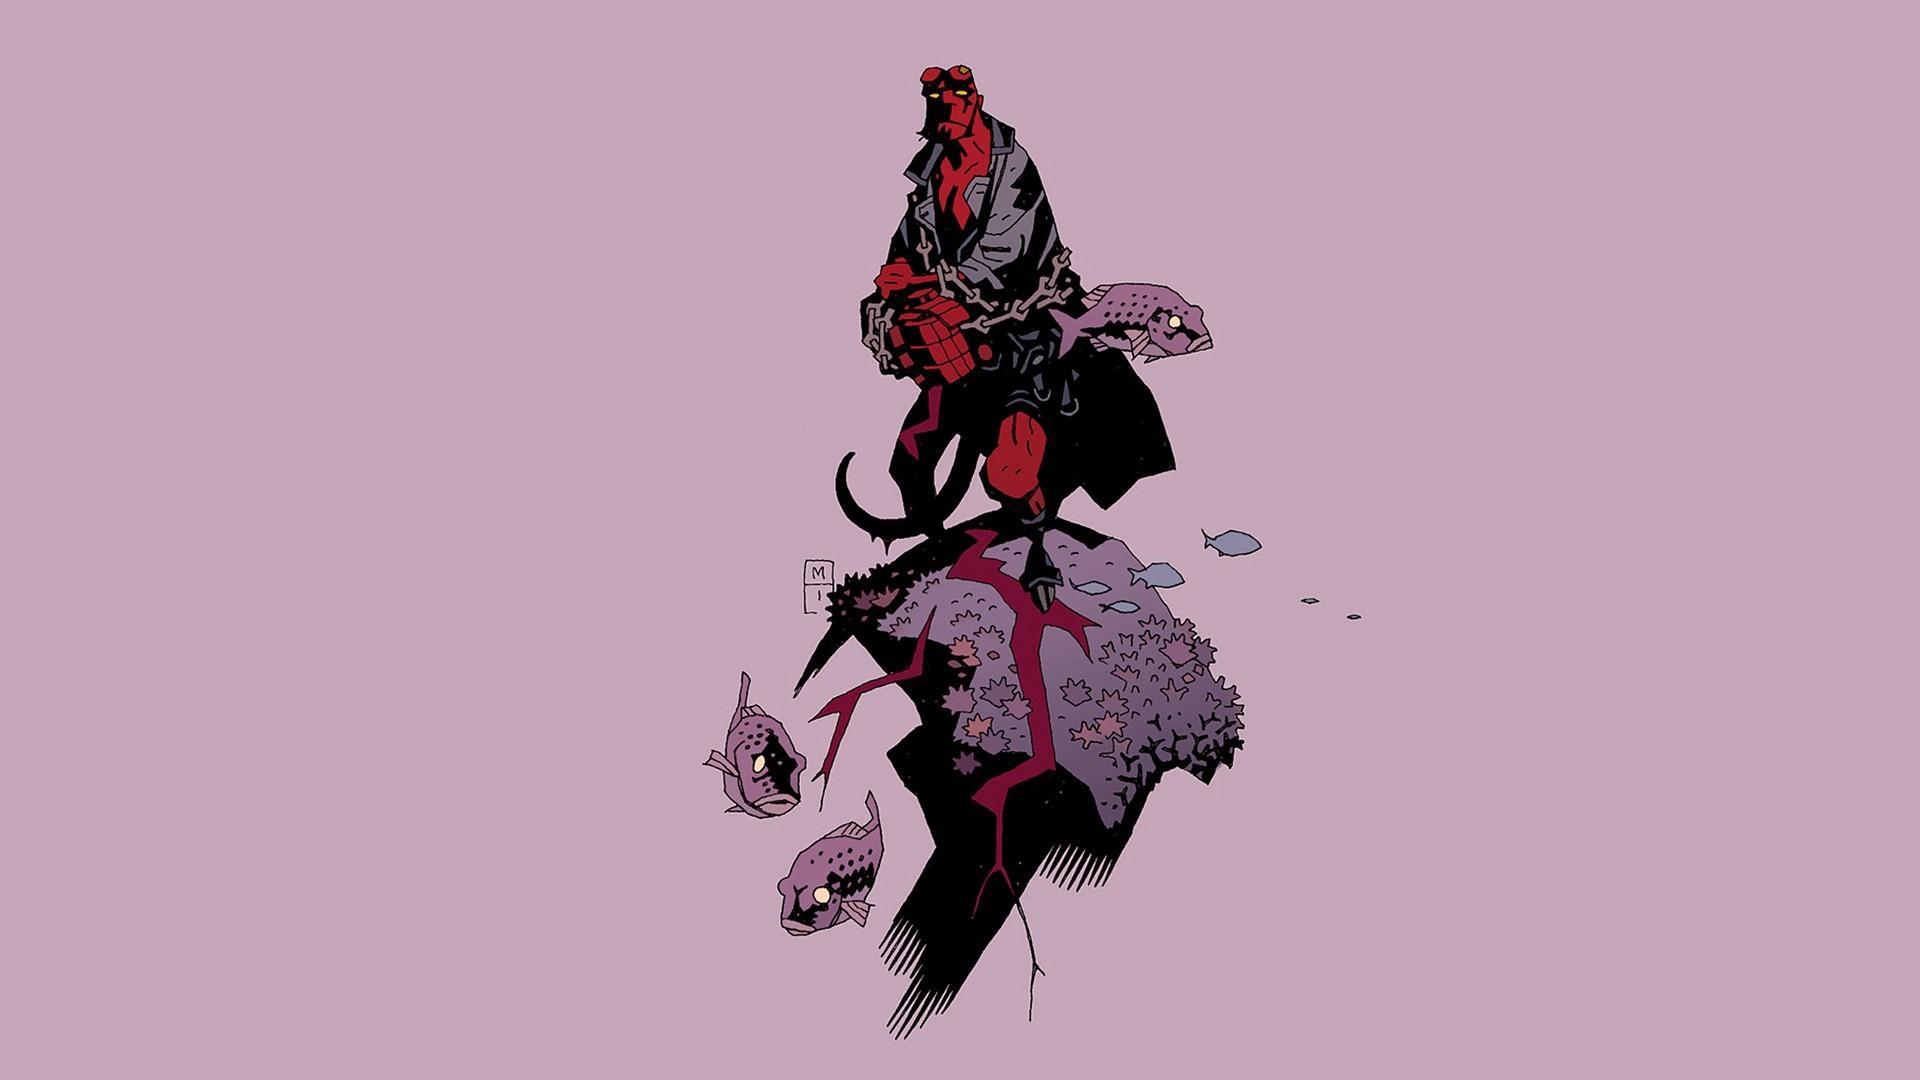 Hellboy Wallpapers for Phones - WallpaperSafari